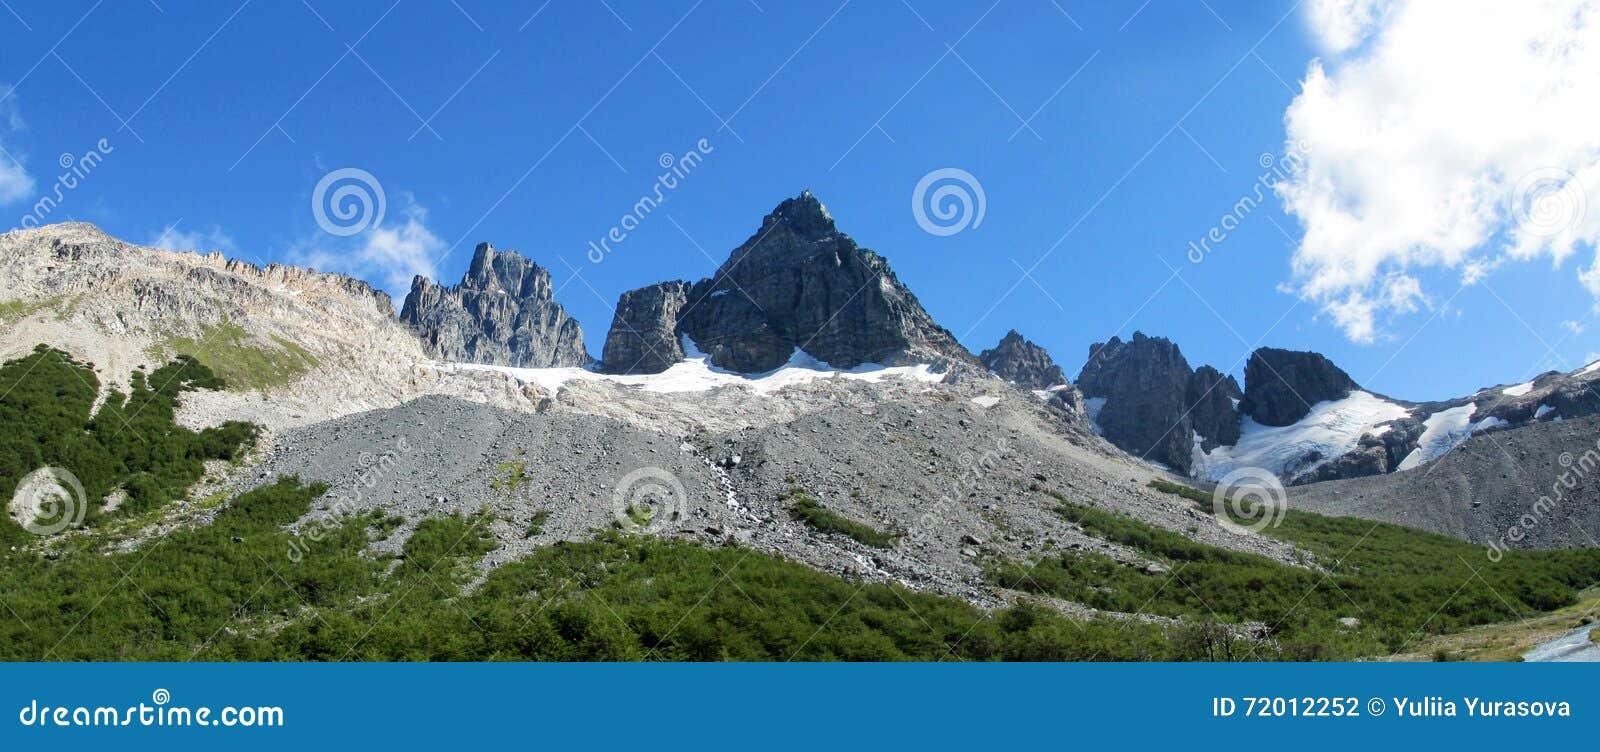 Felsiger Berg in Chile-Patagonia entlang Carretera Austral